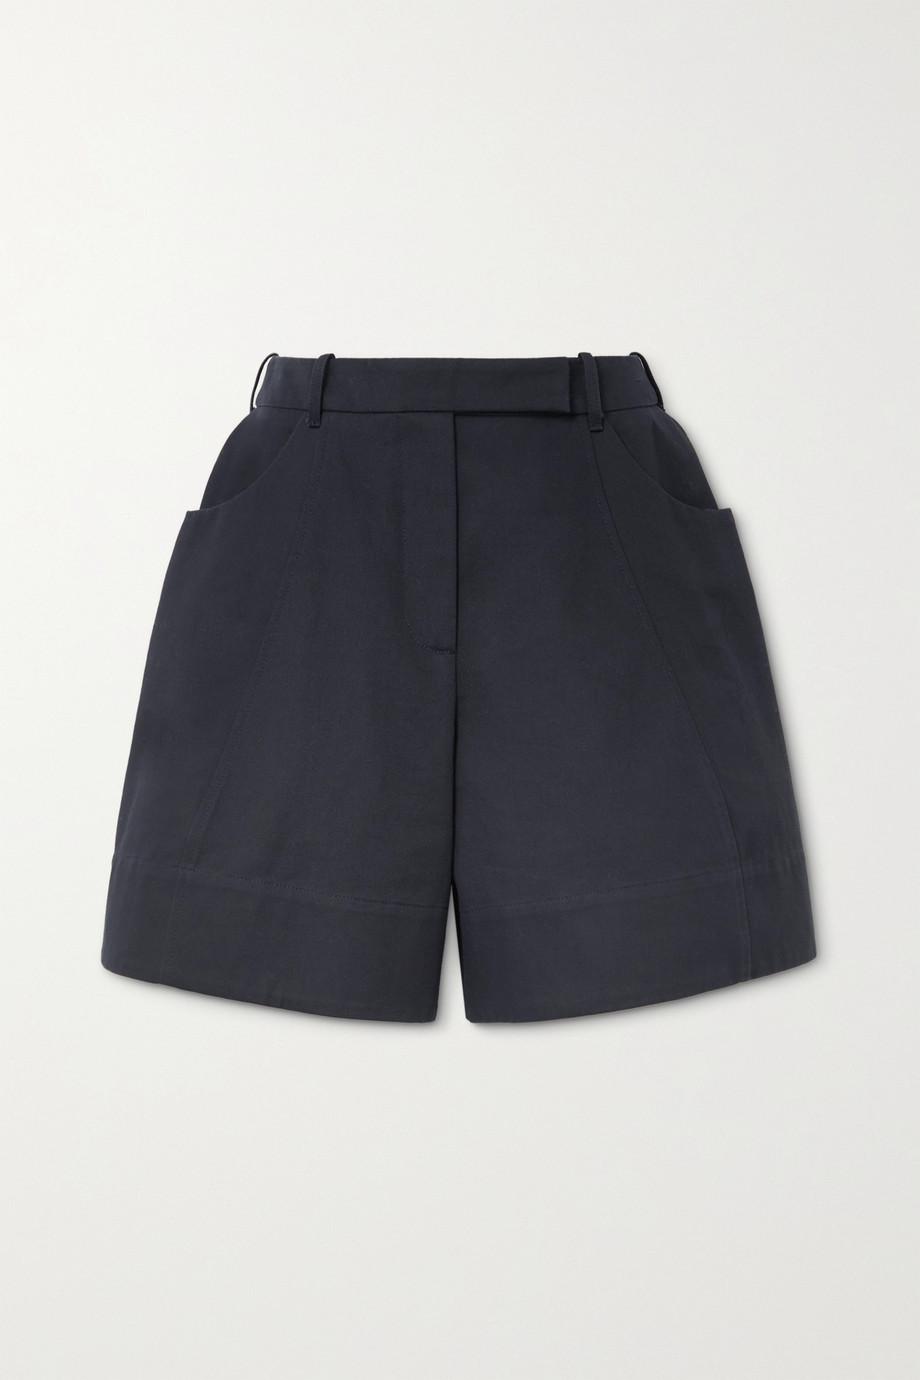 Simone Rocha Cotton-twill shorts